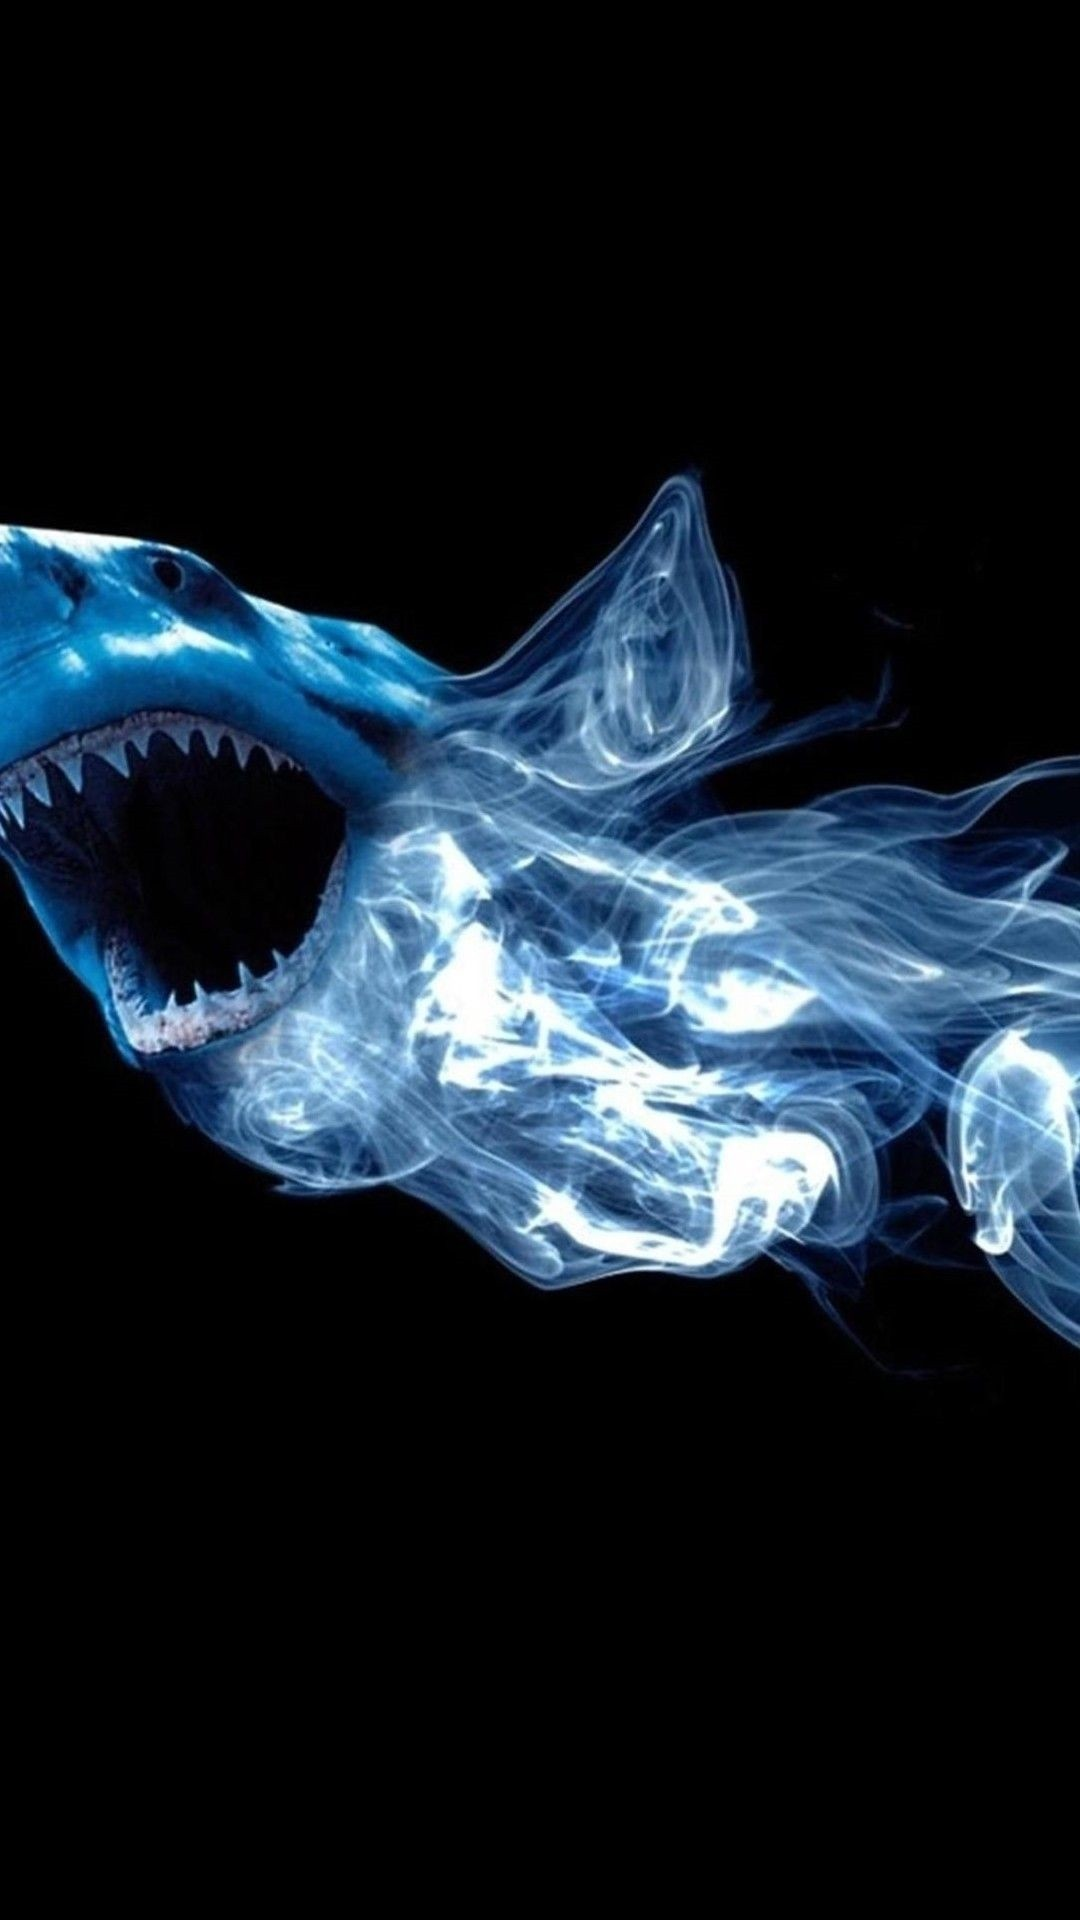 Shark phone background